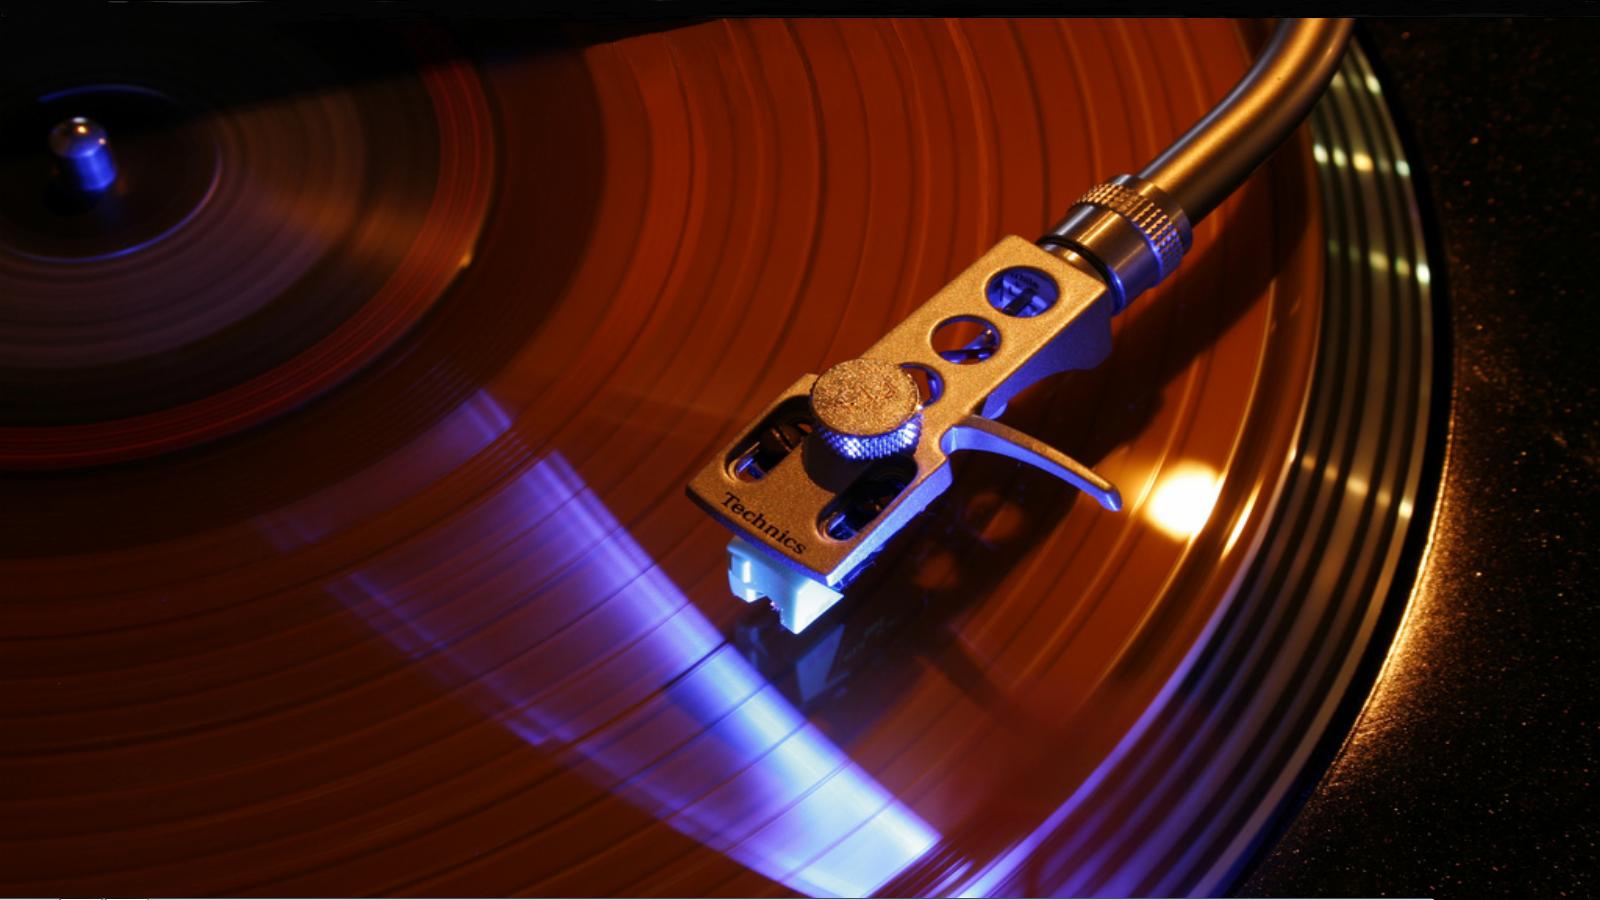 Record vinyl record player wallpaper 1600x900 226889 WallpaperUP 1600x900